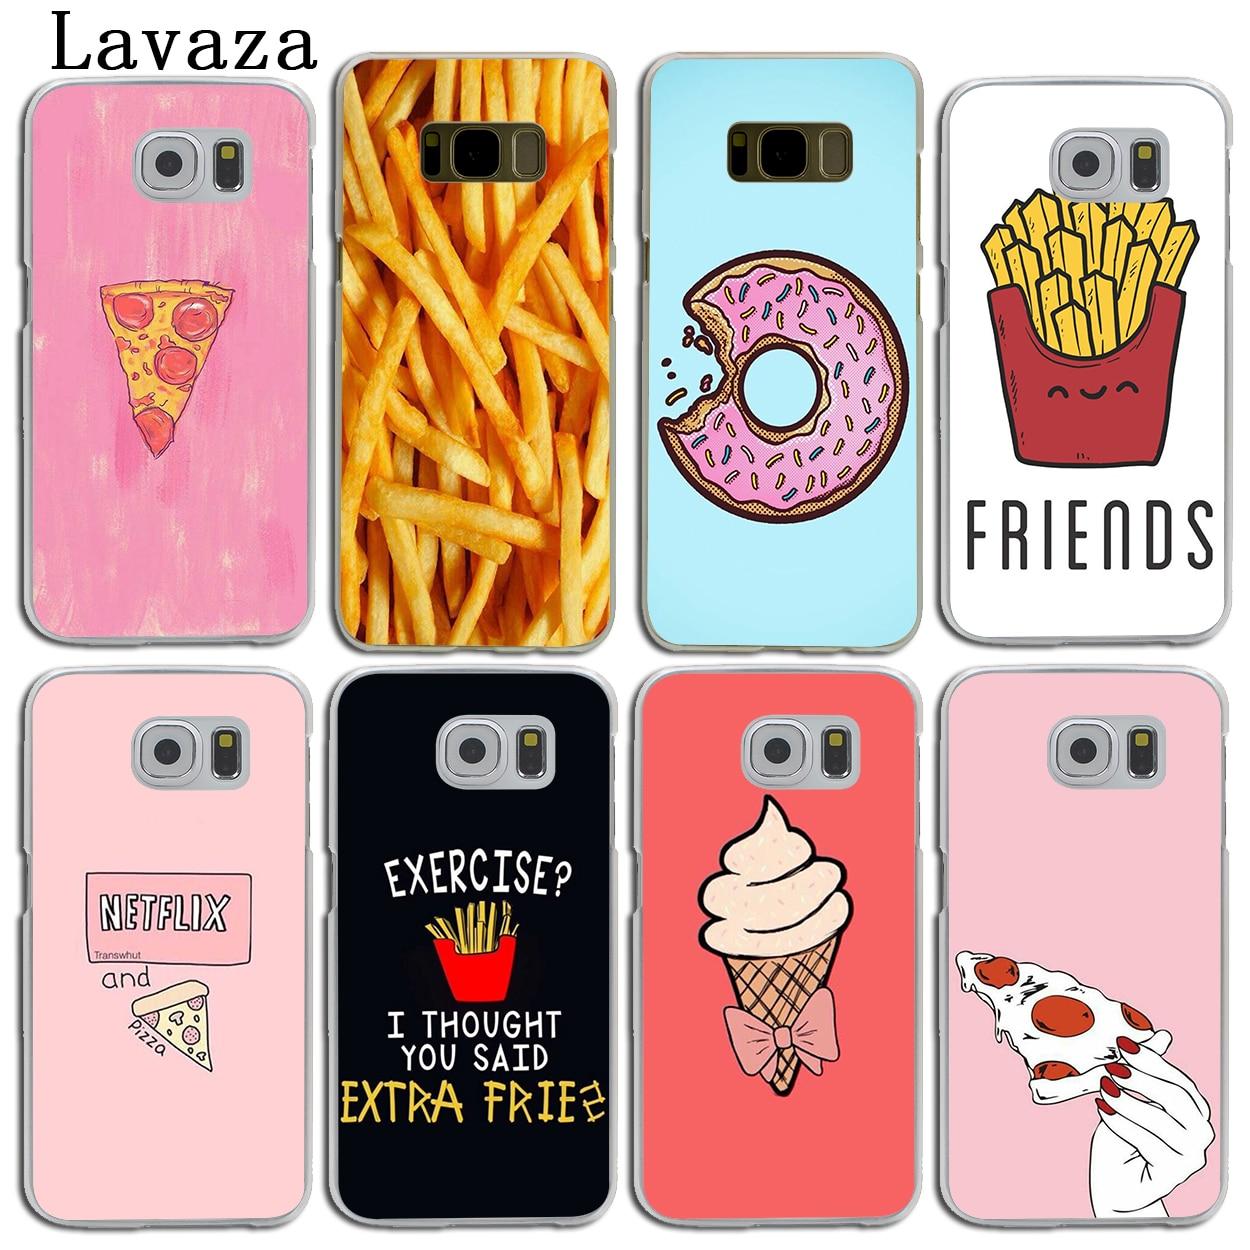 samsung s8 phone case pizza